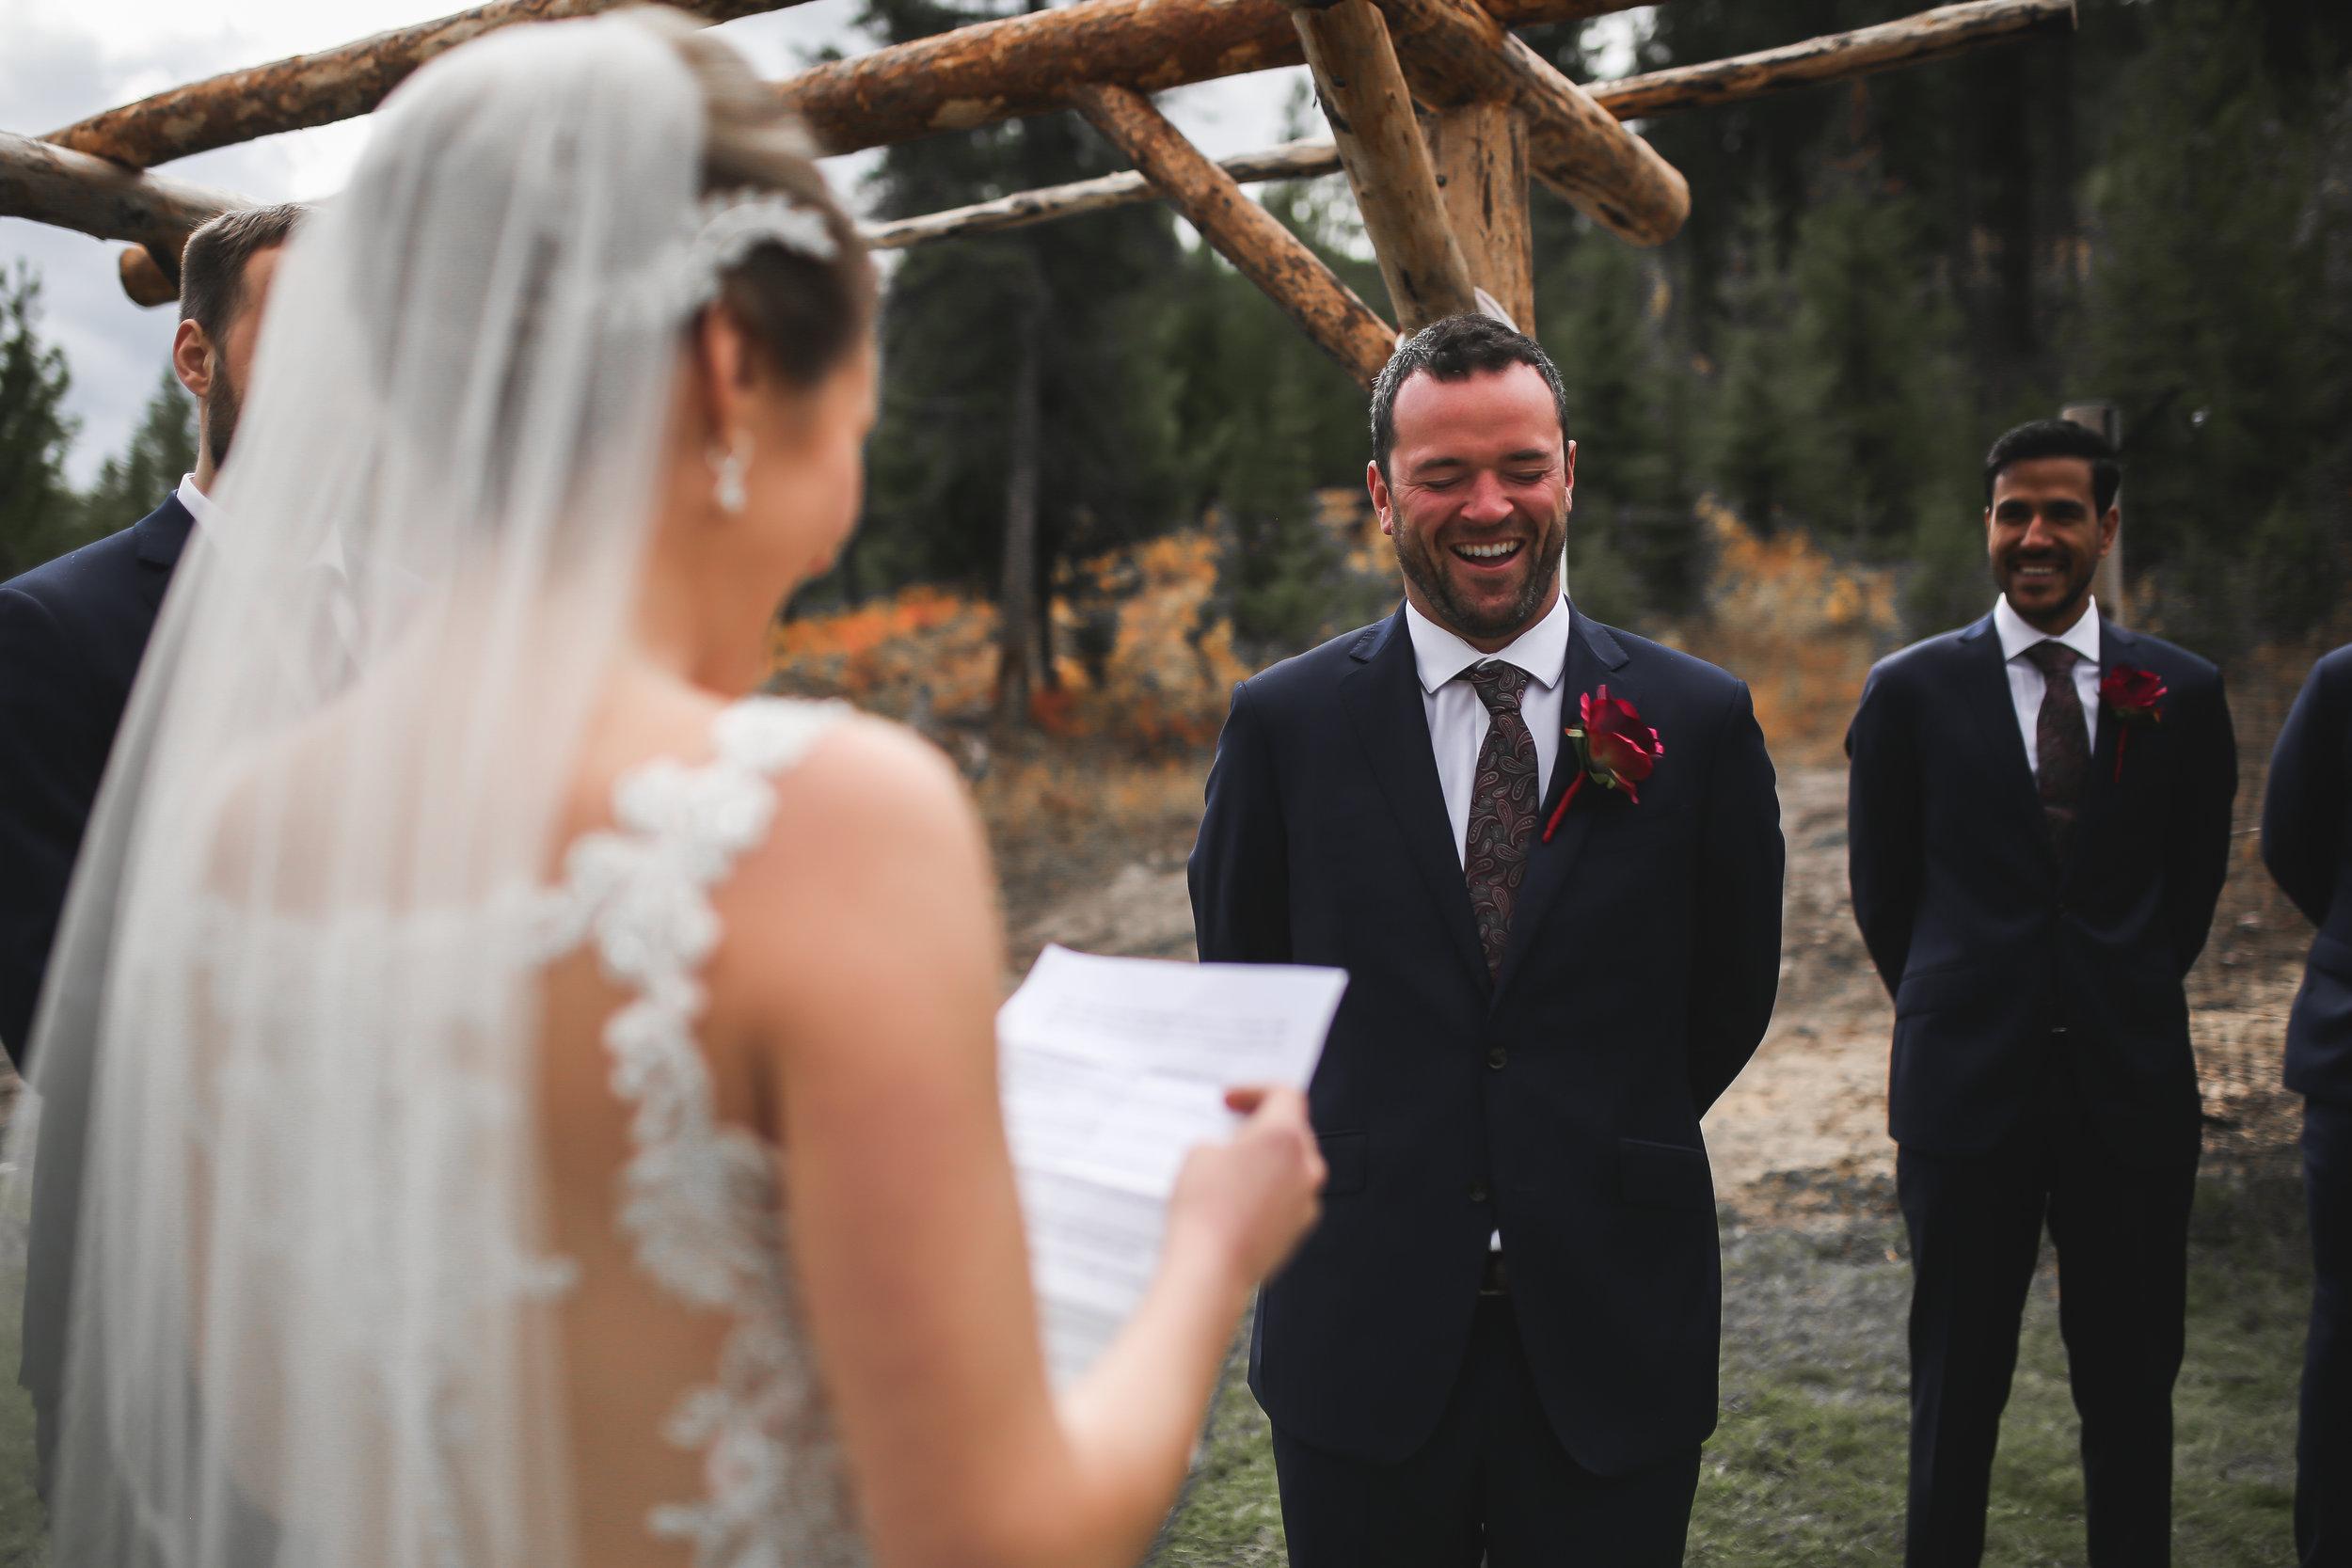 138 Adam Ziorio Photography - Vitoria wedding photographer Nick&Bree Fernie Wedding.jpg